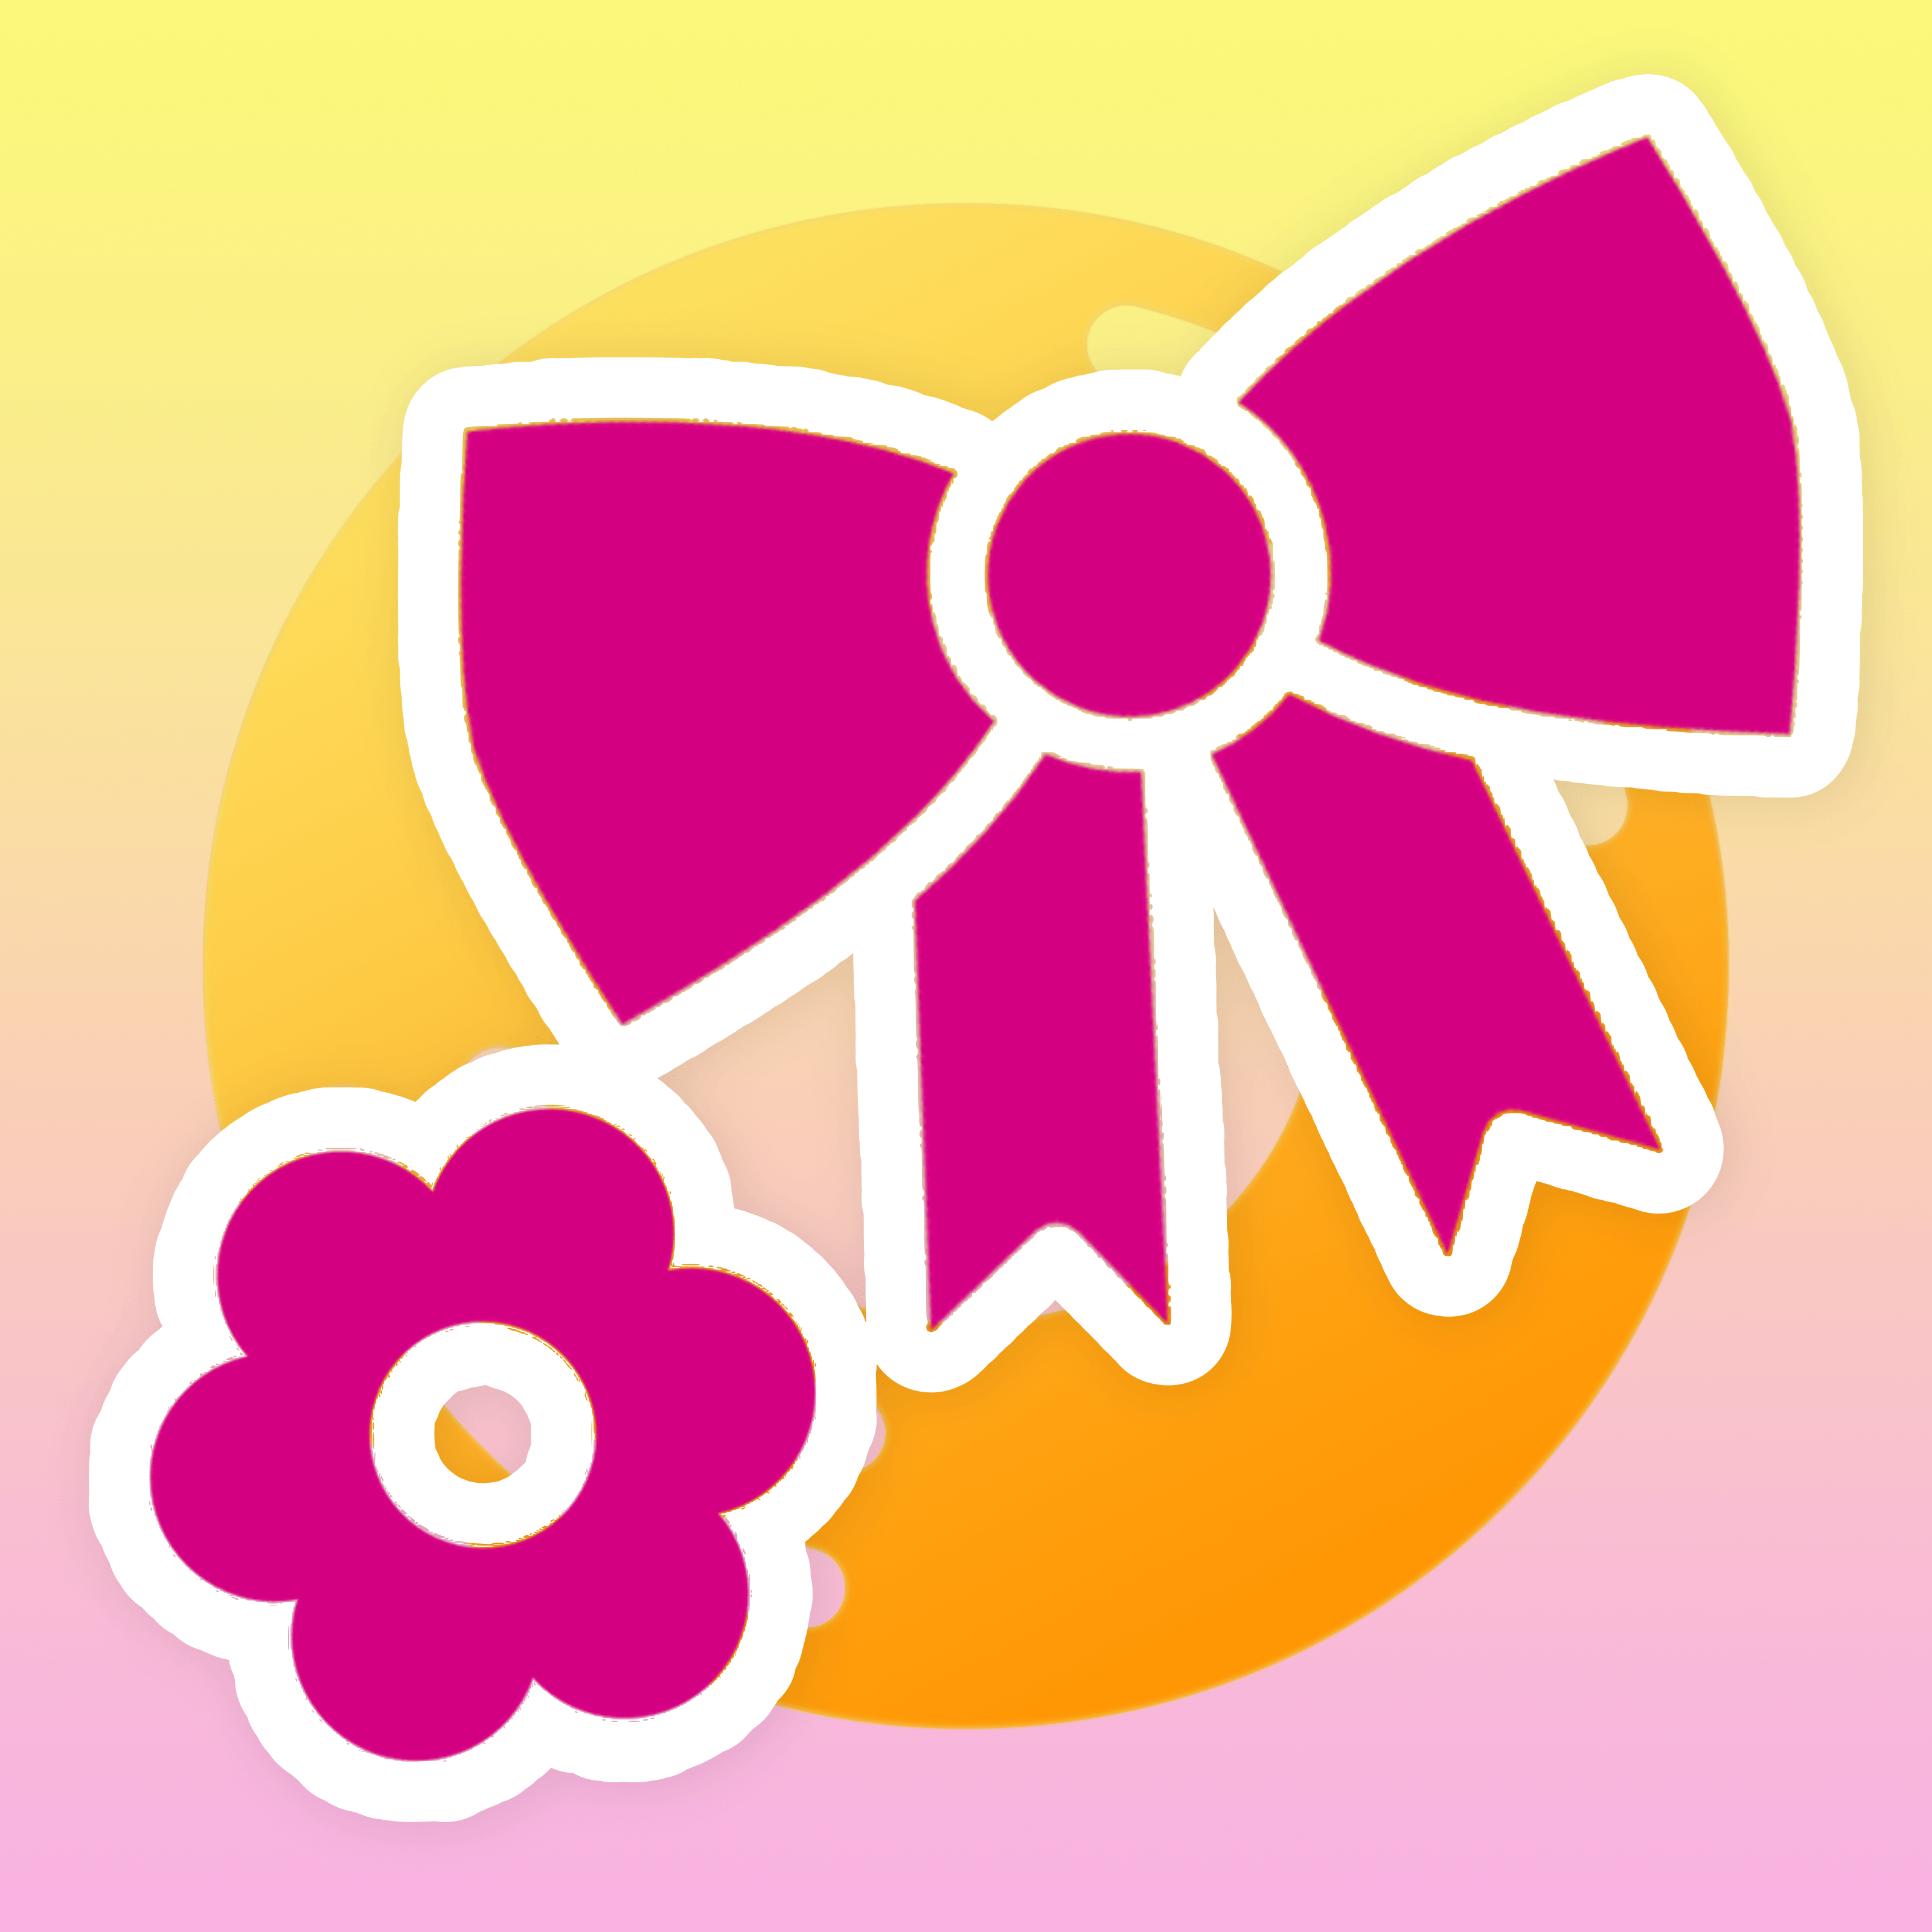 L1rou_aka avatar